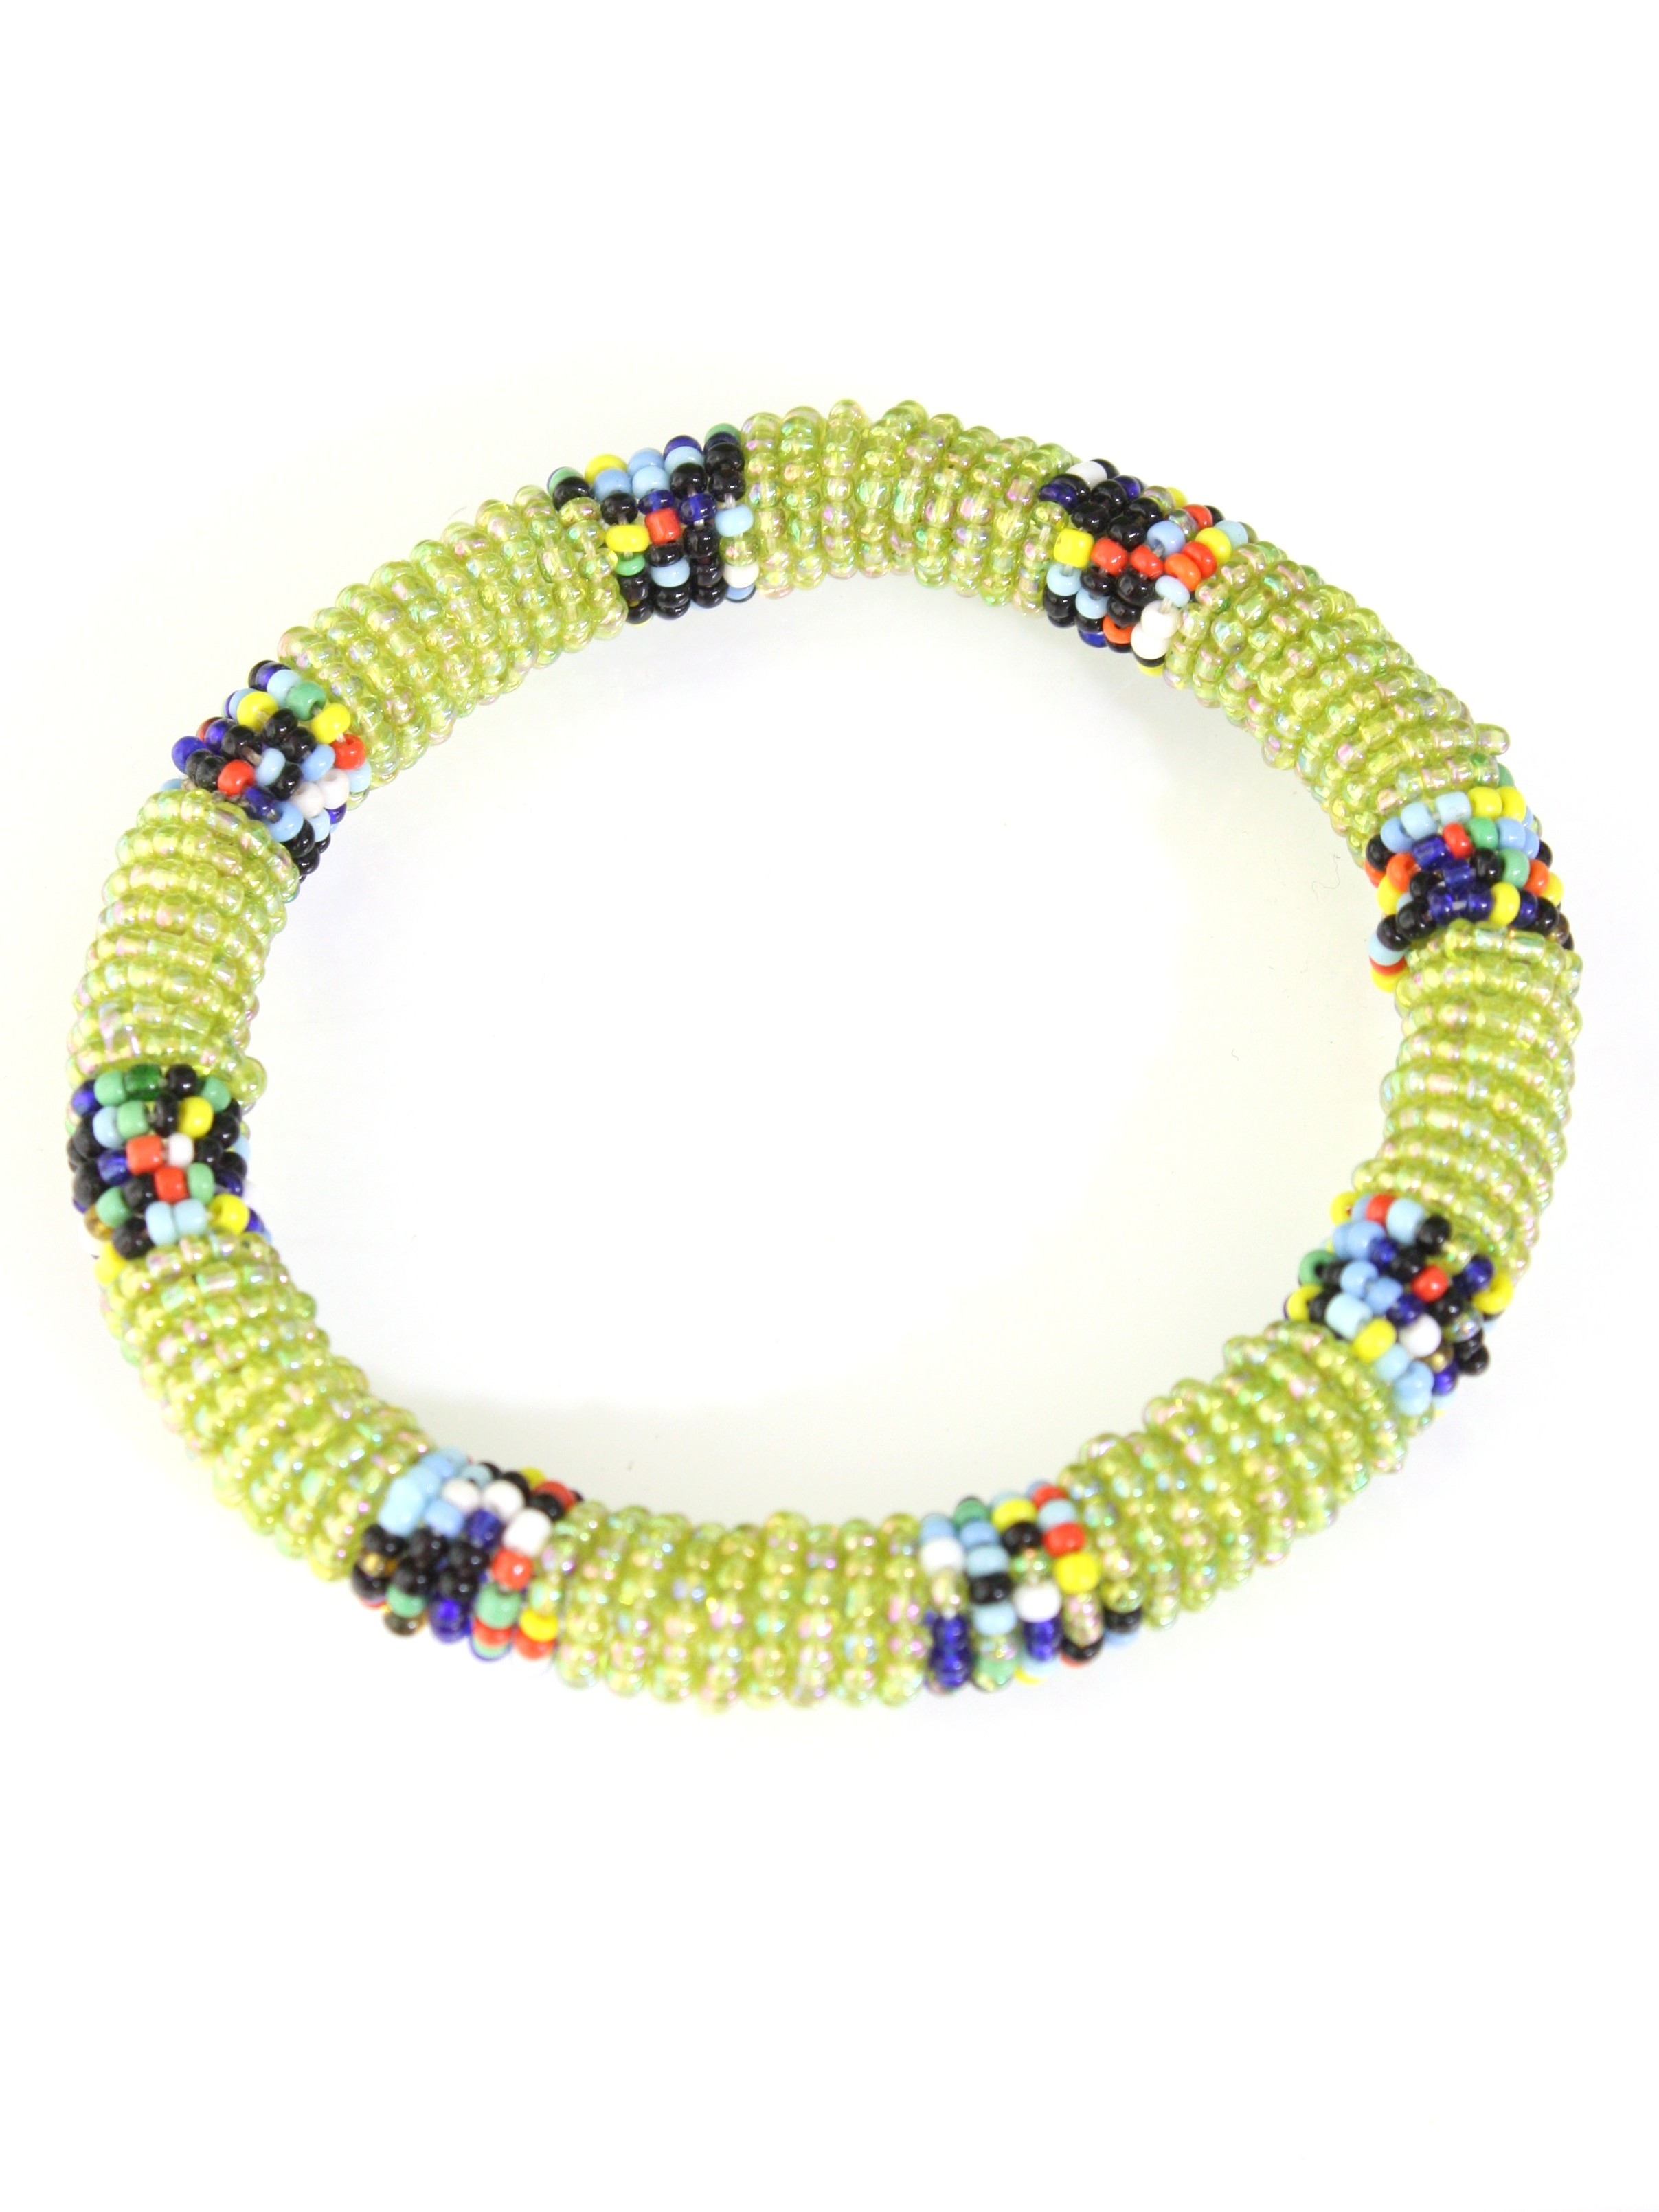 d5006c54fa4 Vintage 90s Bracelet: 90s -No Mark- Womens light green background ...